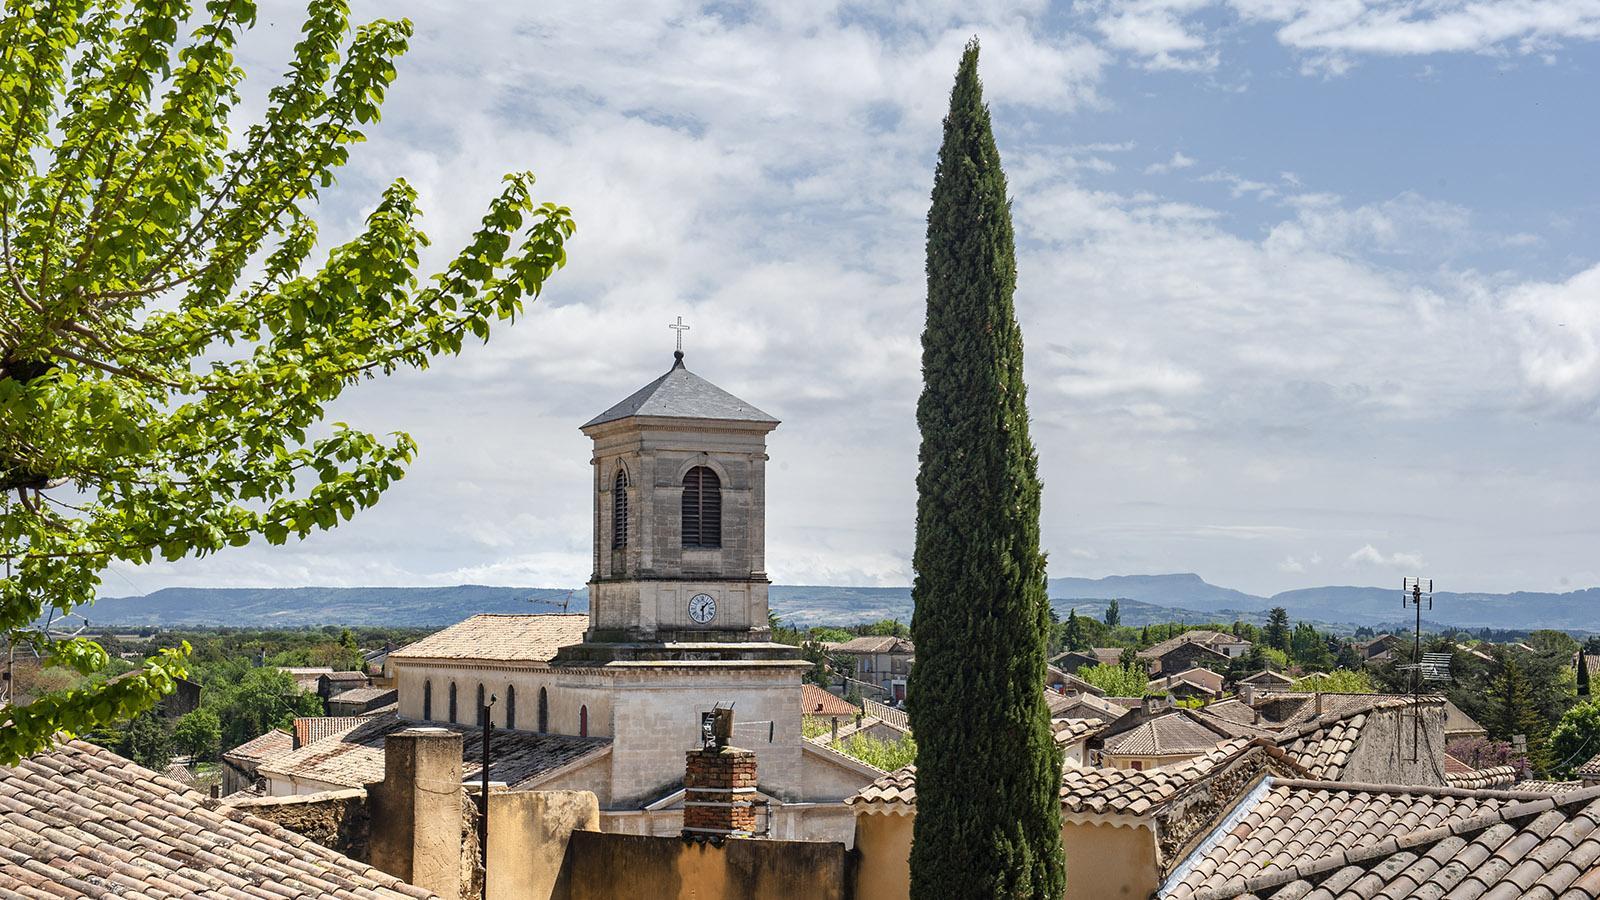 Blick auf Suze-la-Rousse vom Burgschloss aus. Foto: Hilke Maunder